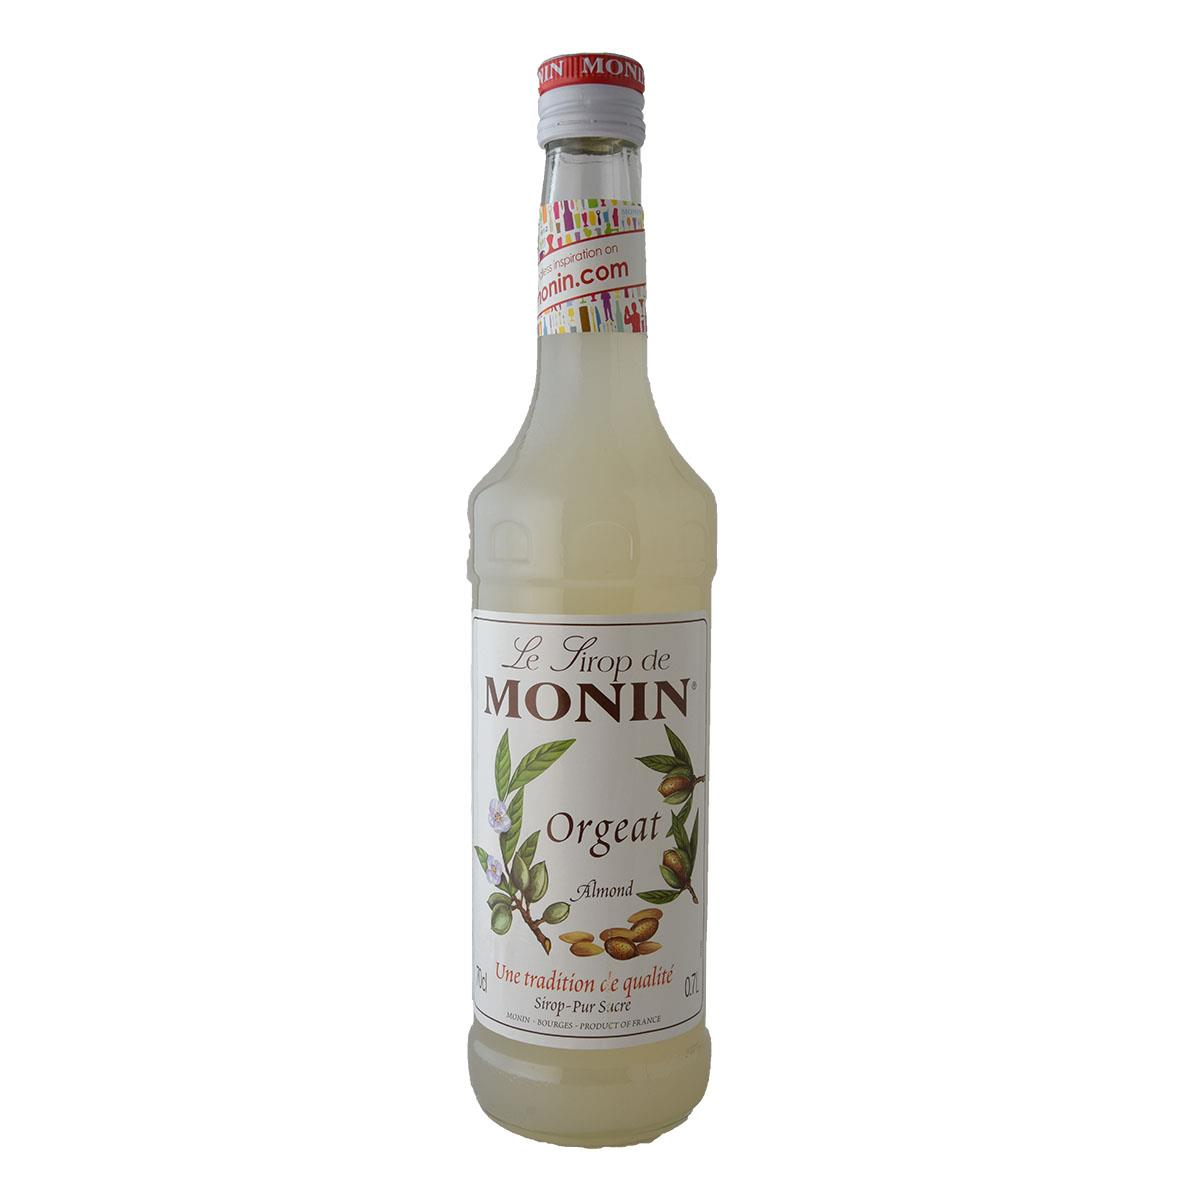 Monin Σιρόπι Αμύγδαλο 700ml